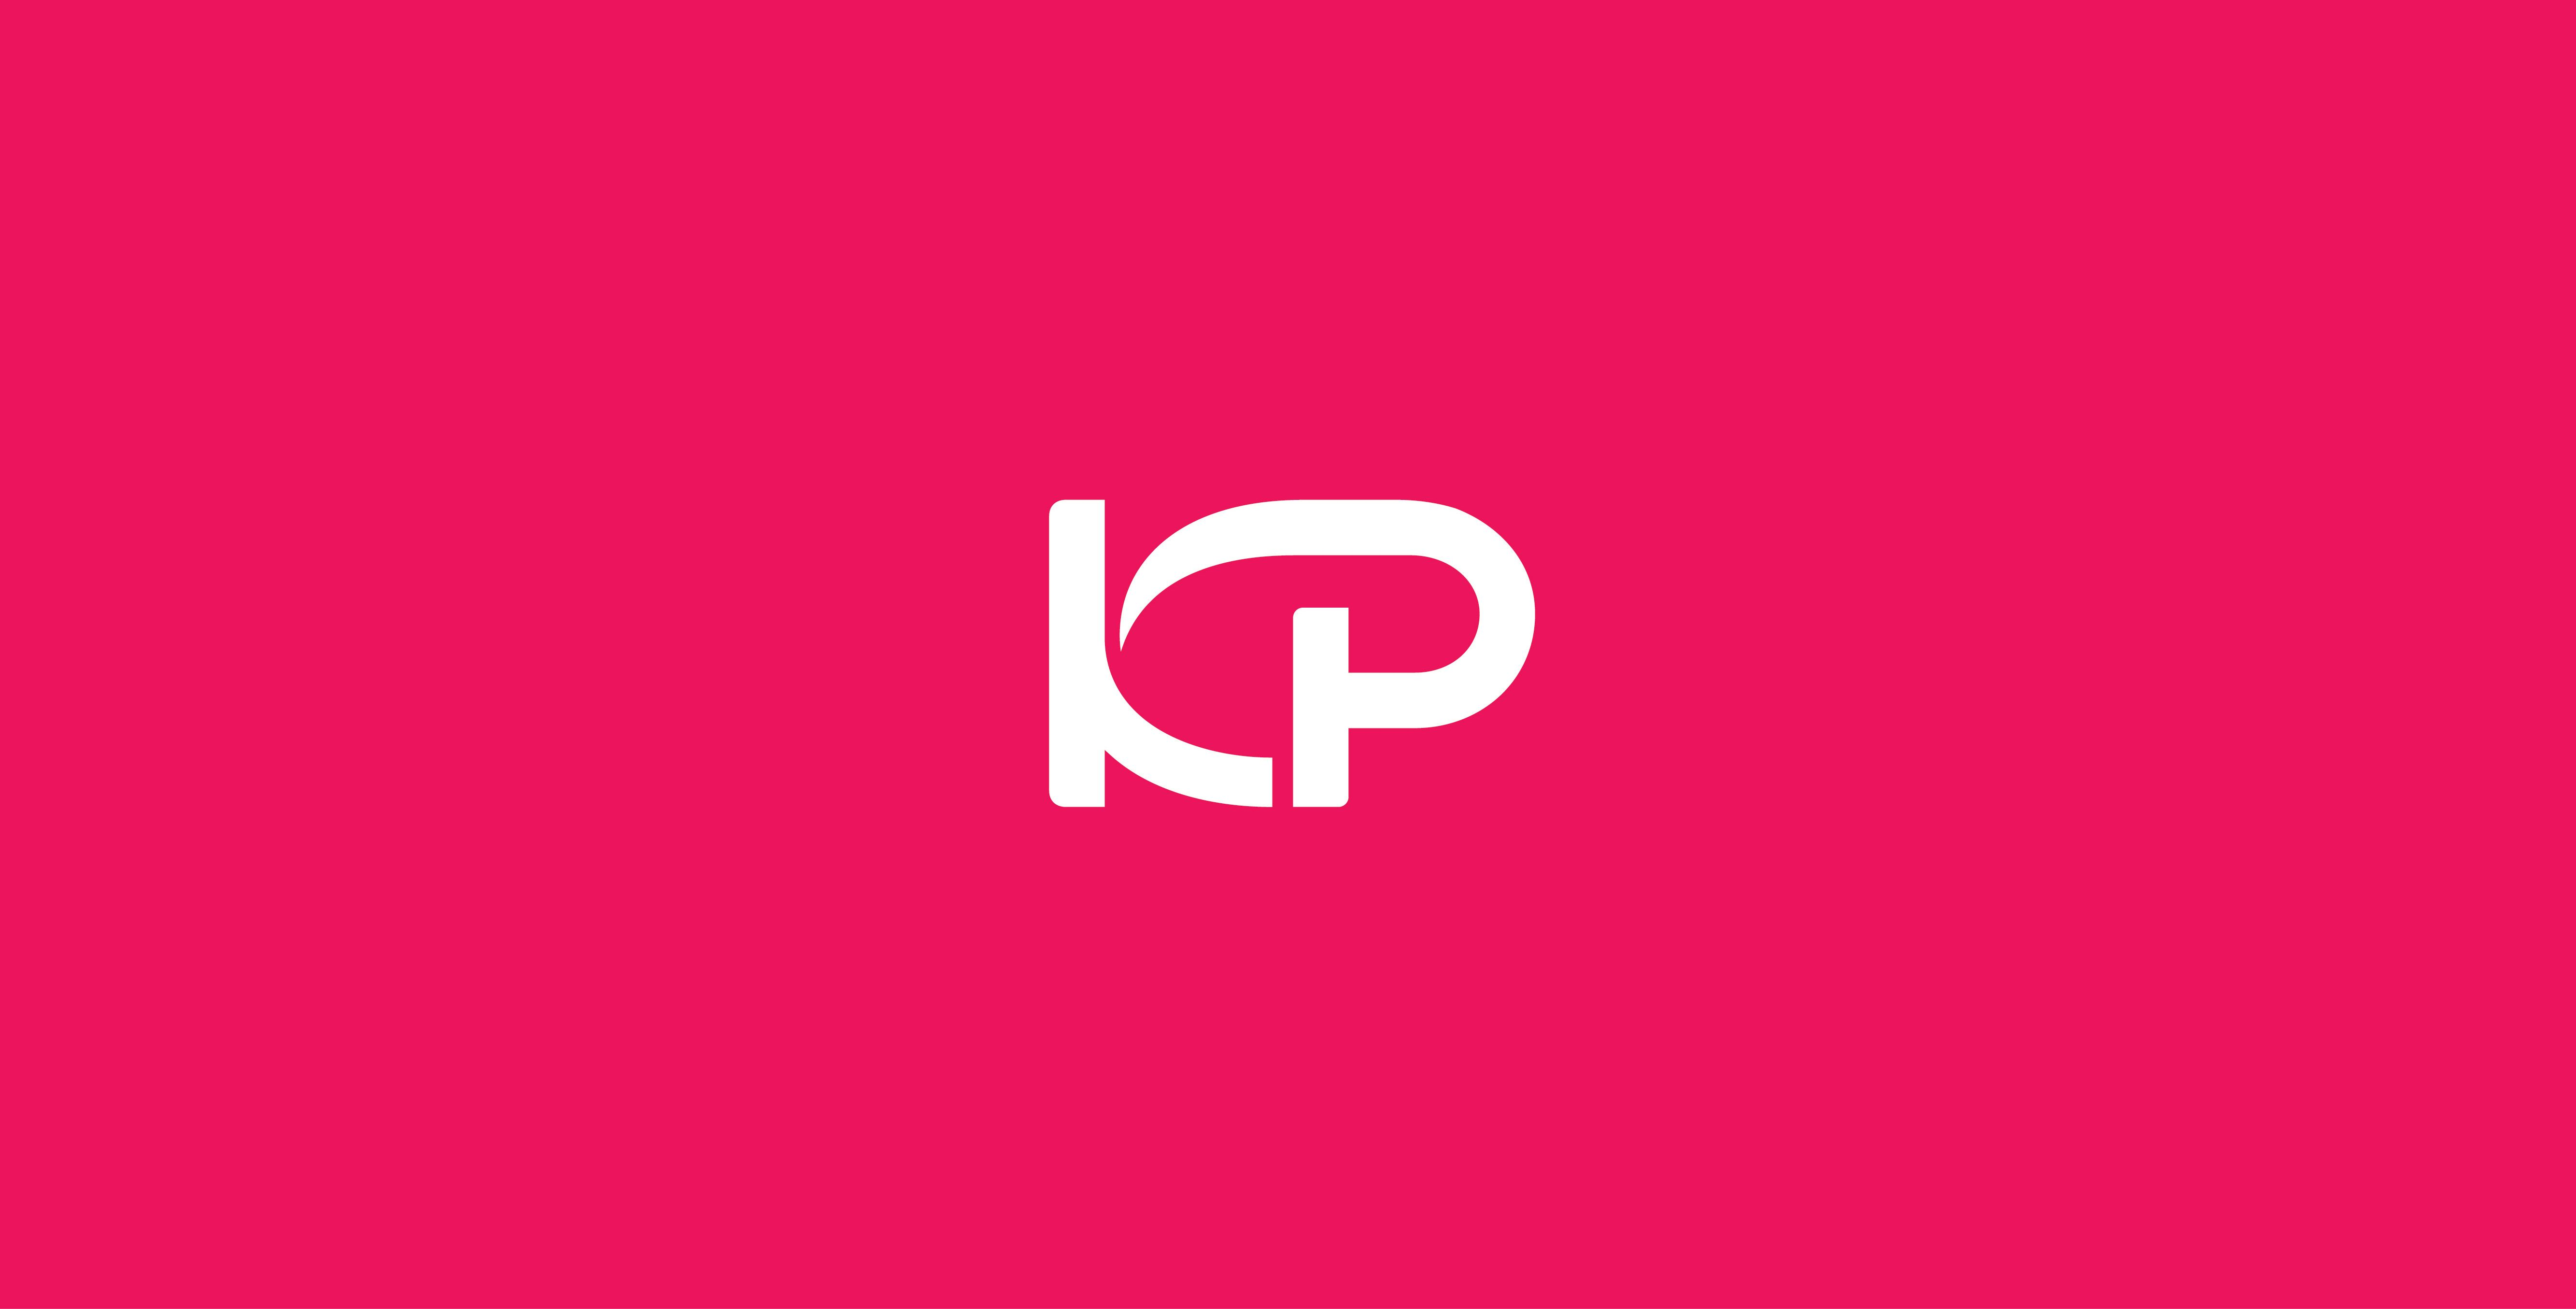 Design by ID.BRIDGE KP, logo Logo branding identity